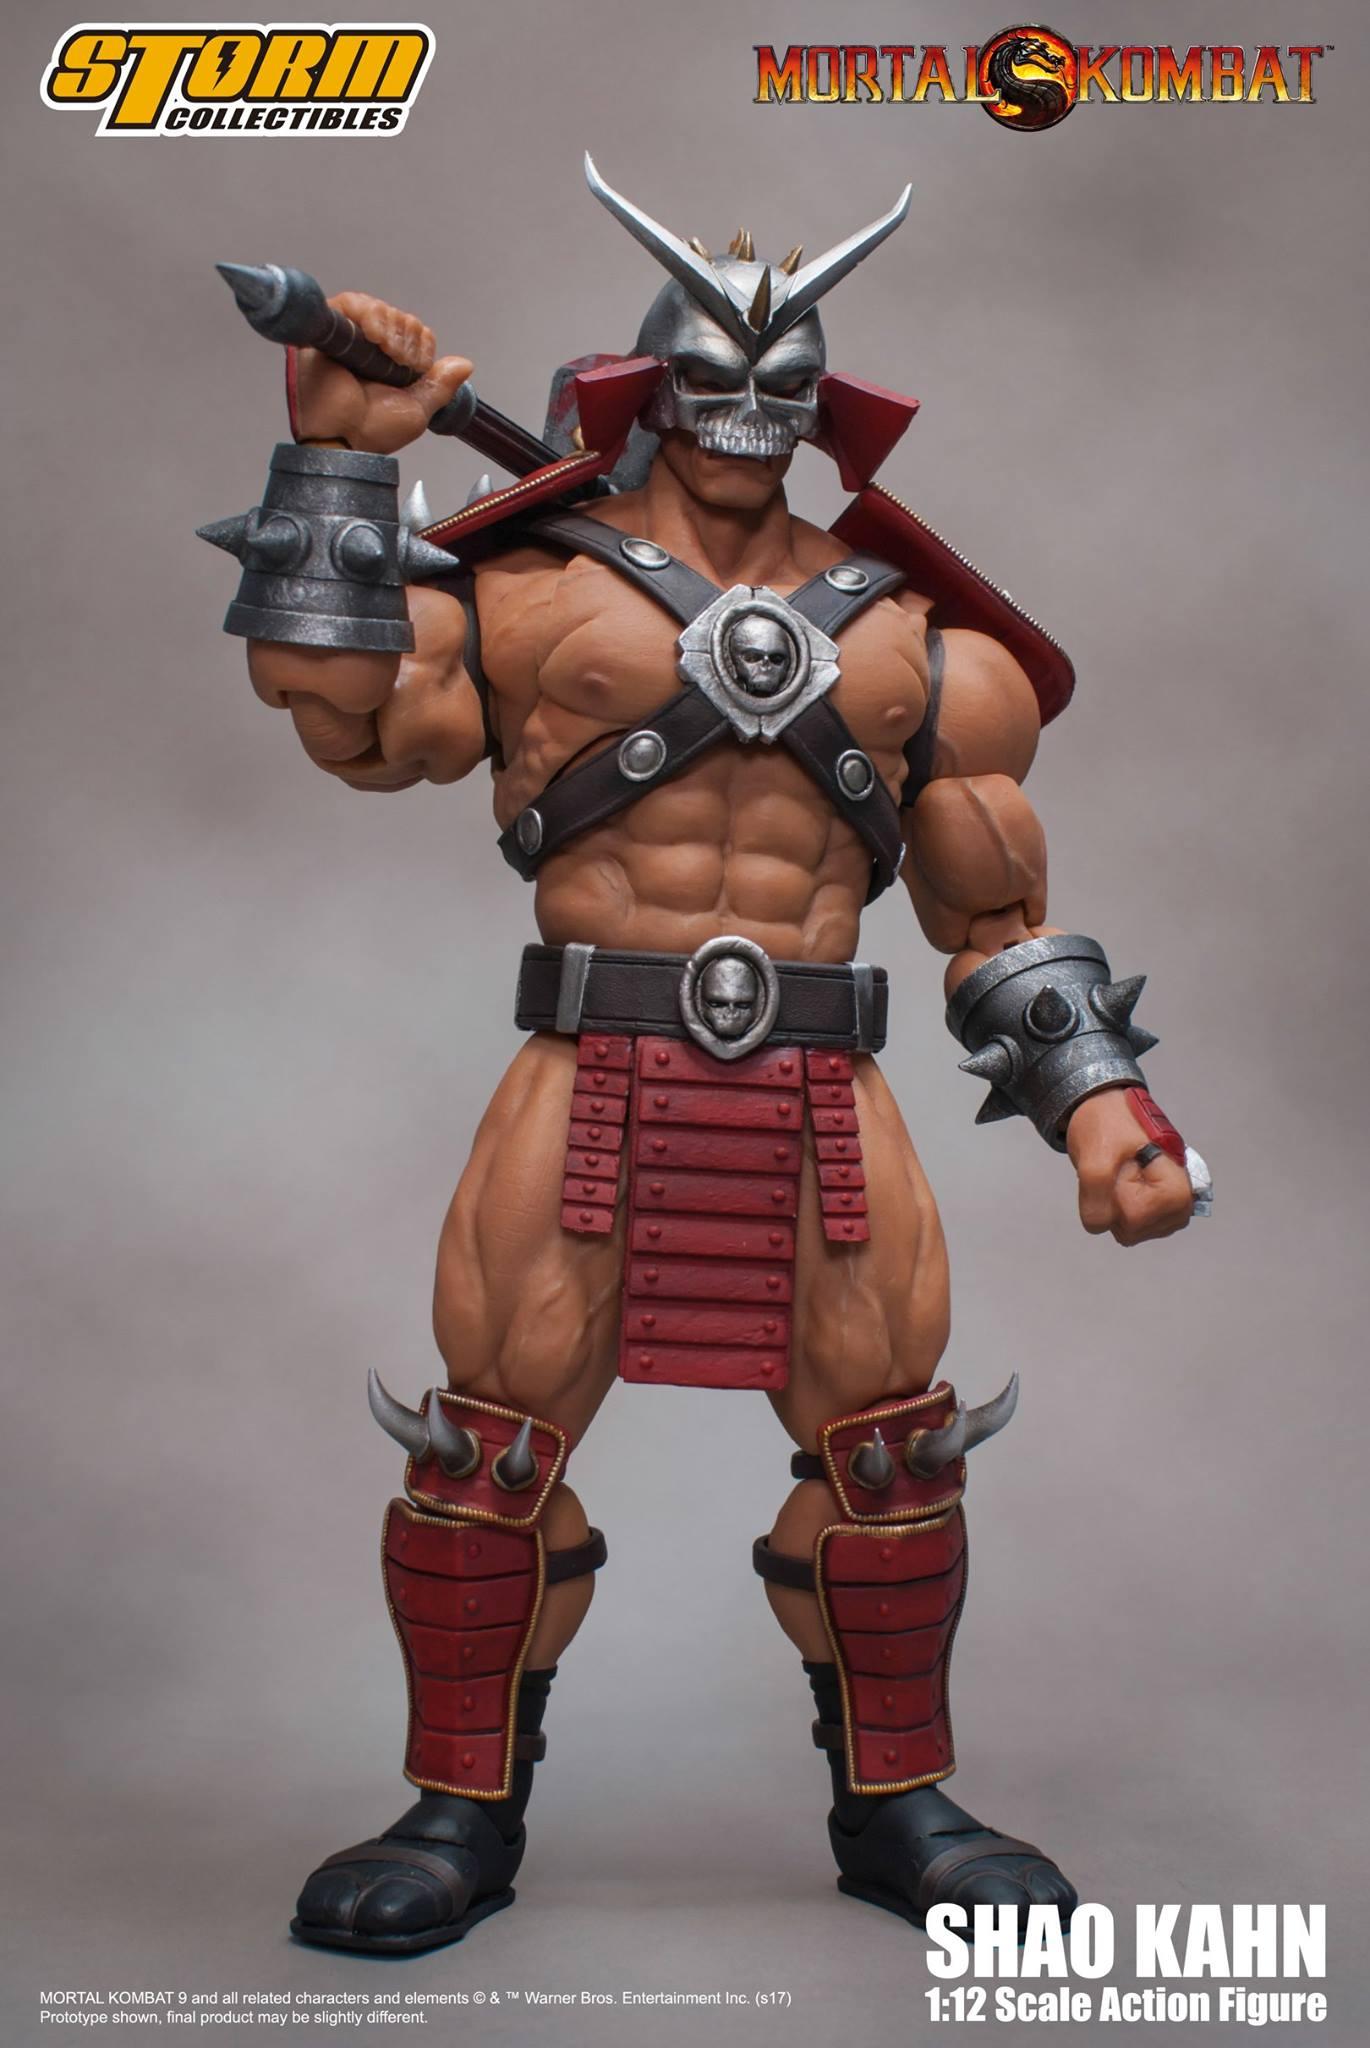 Shao Kahn Voice - Mortal Kombat franchise   Behind The ...  Mortal Kombat Movie Shao Kahn